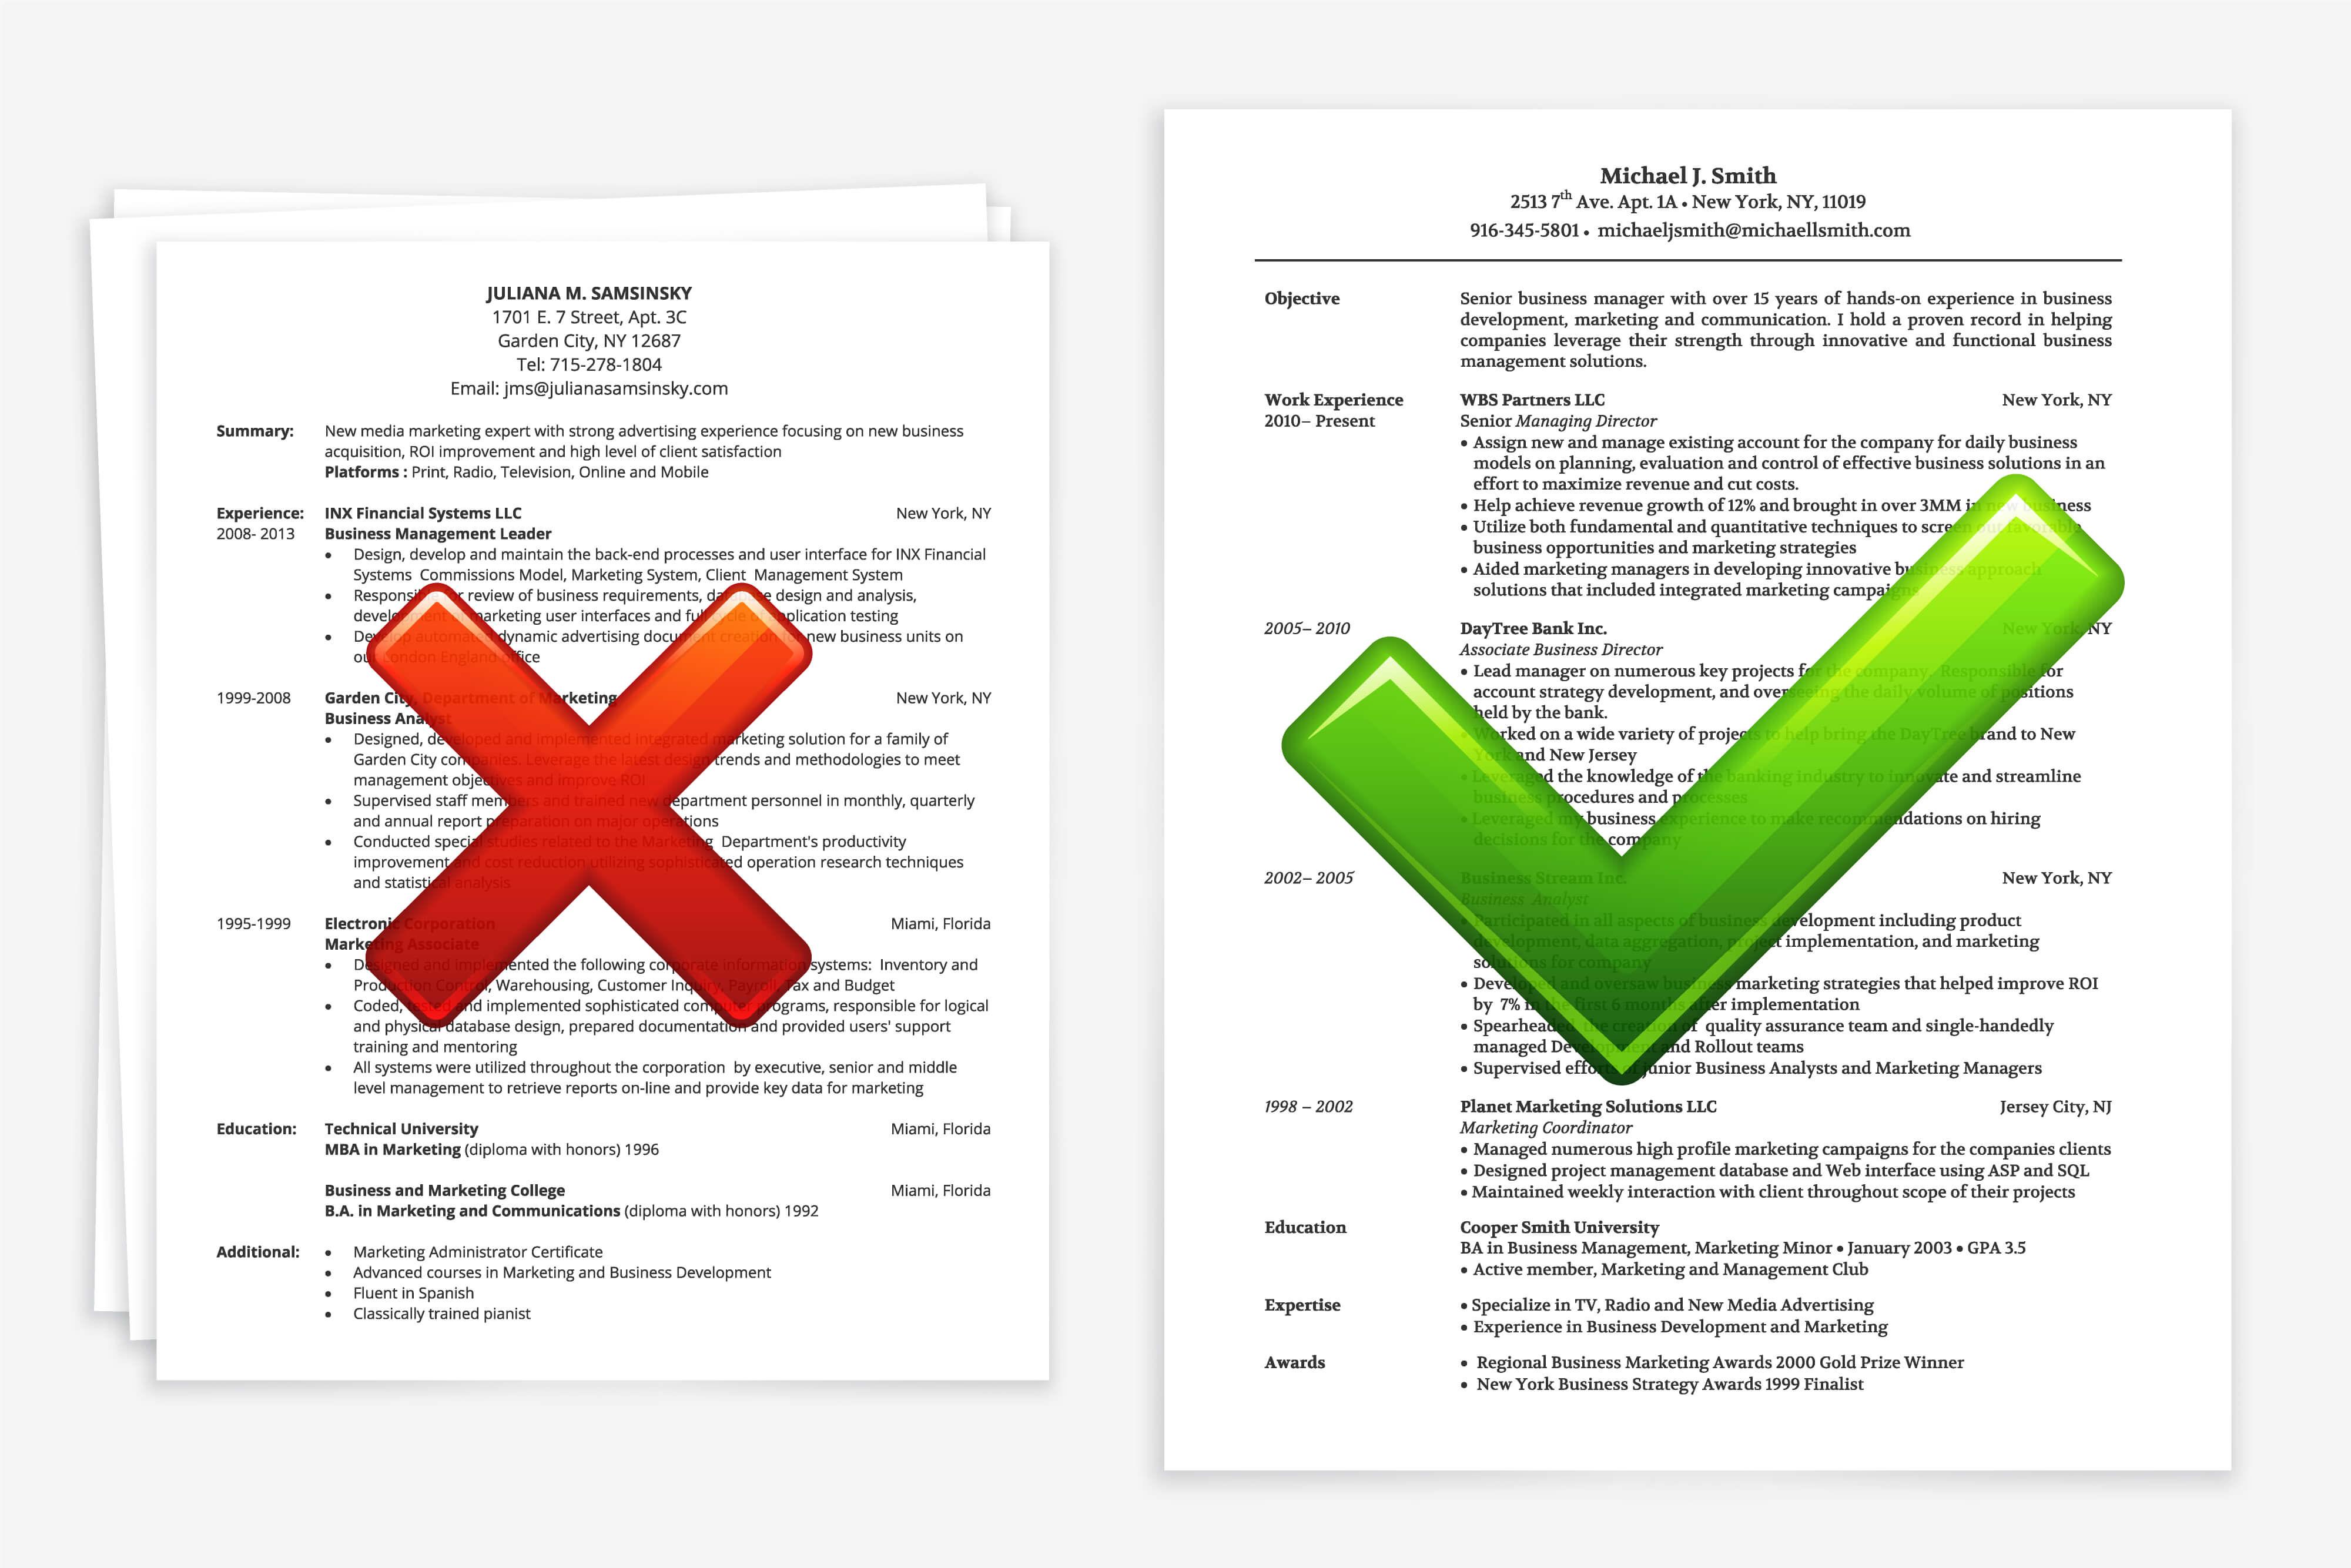 vitae curriculum vitae template example of curriculum vitae resume